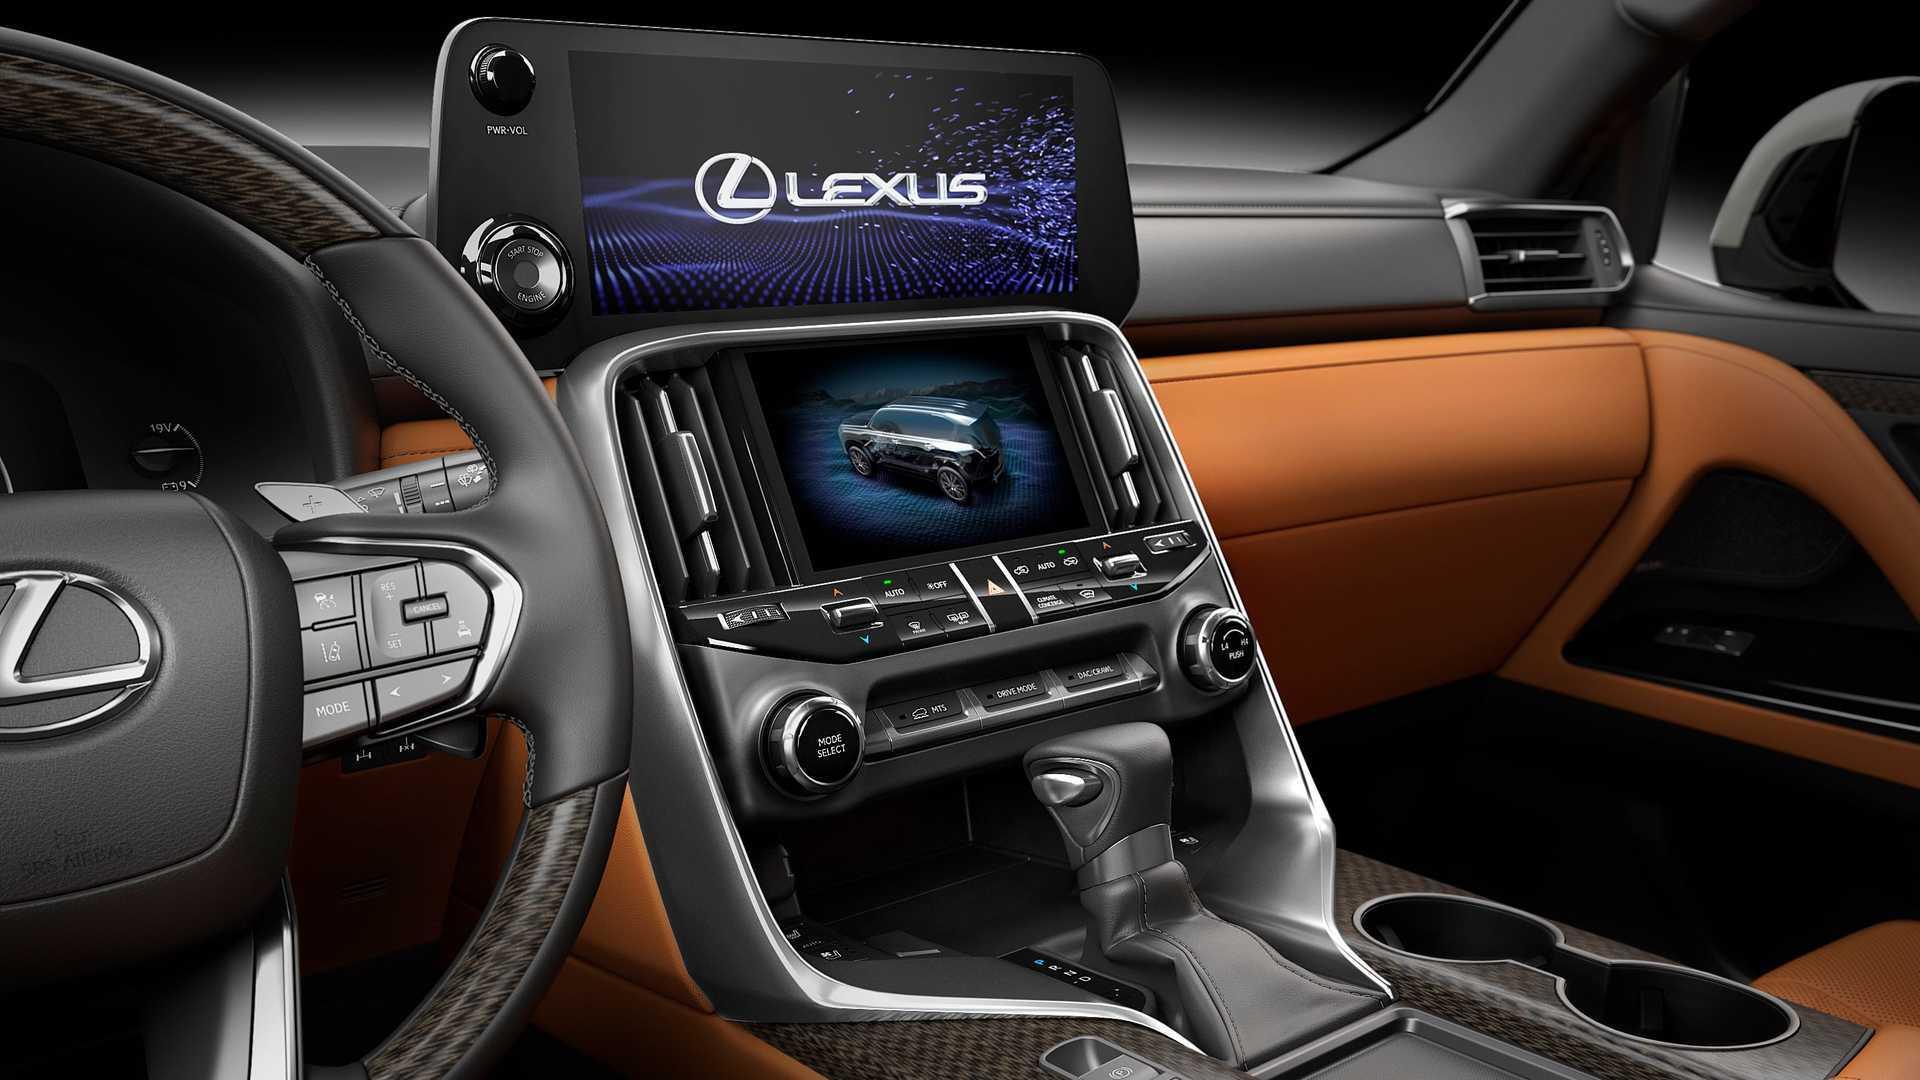 2022-lexus-lx-600.jpg